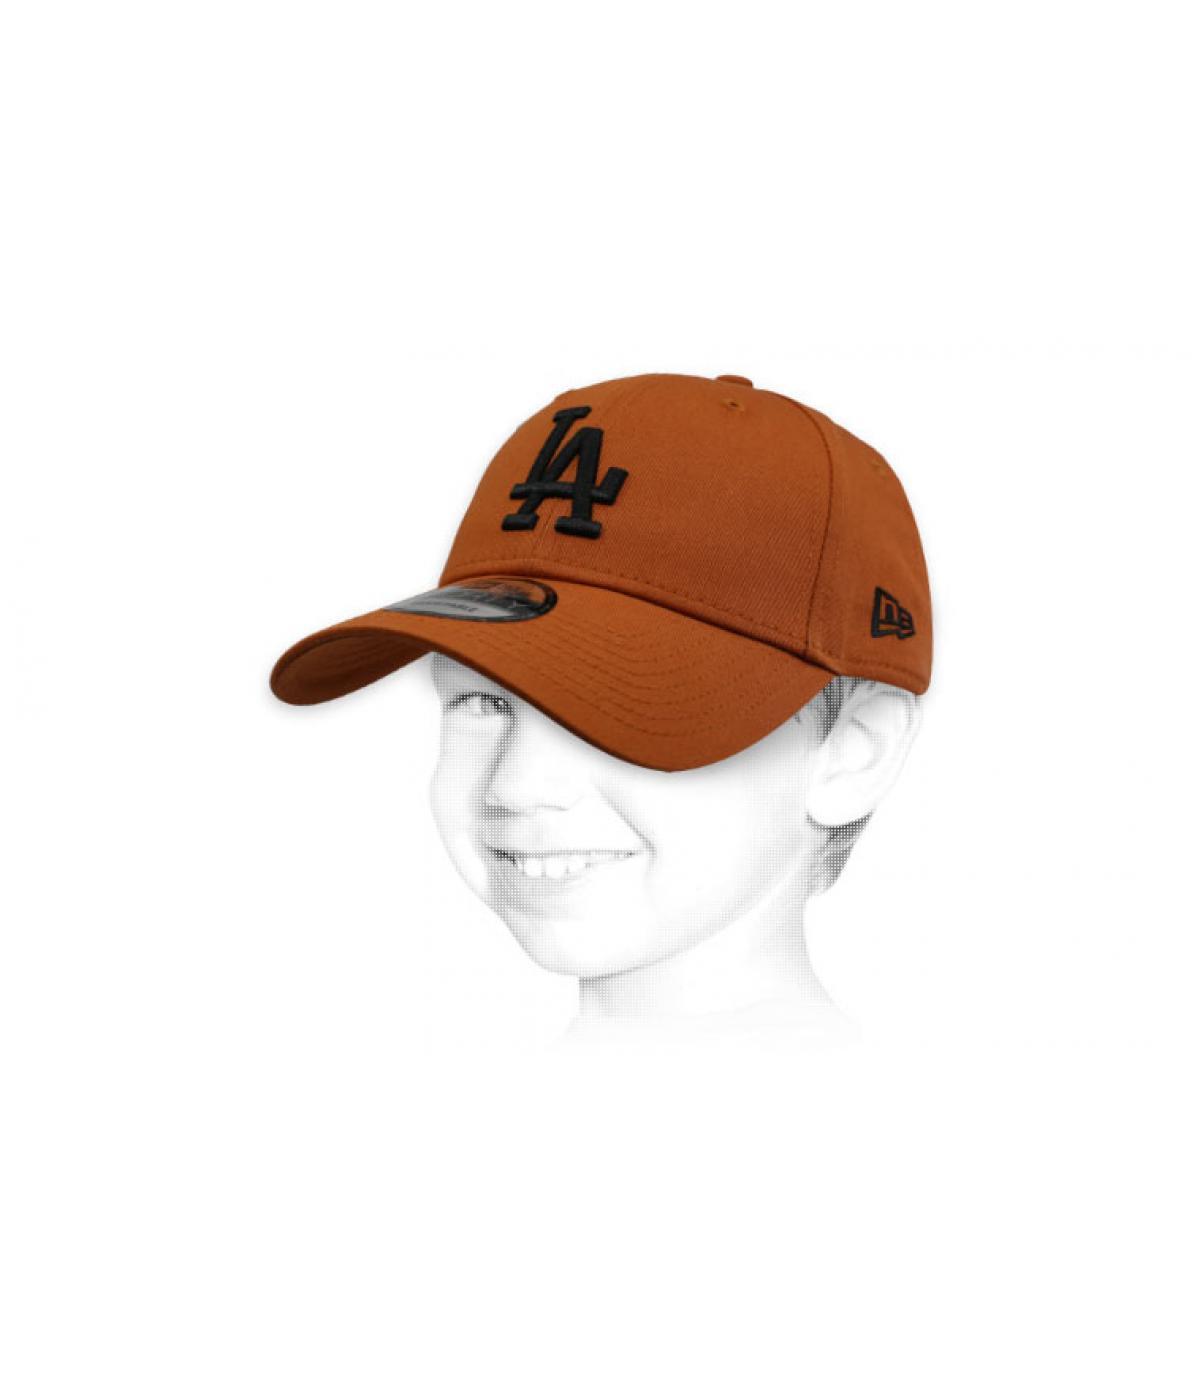 LA child cap brown